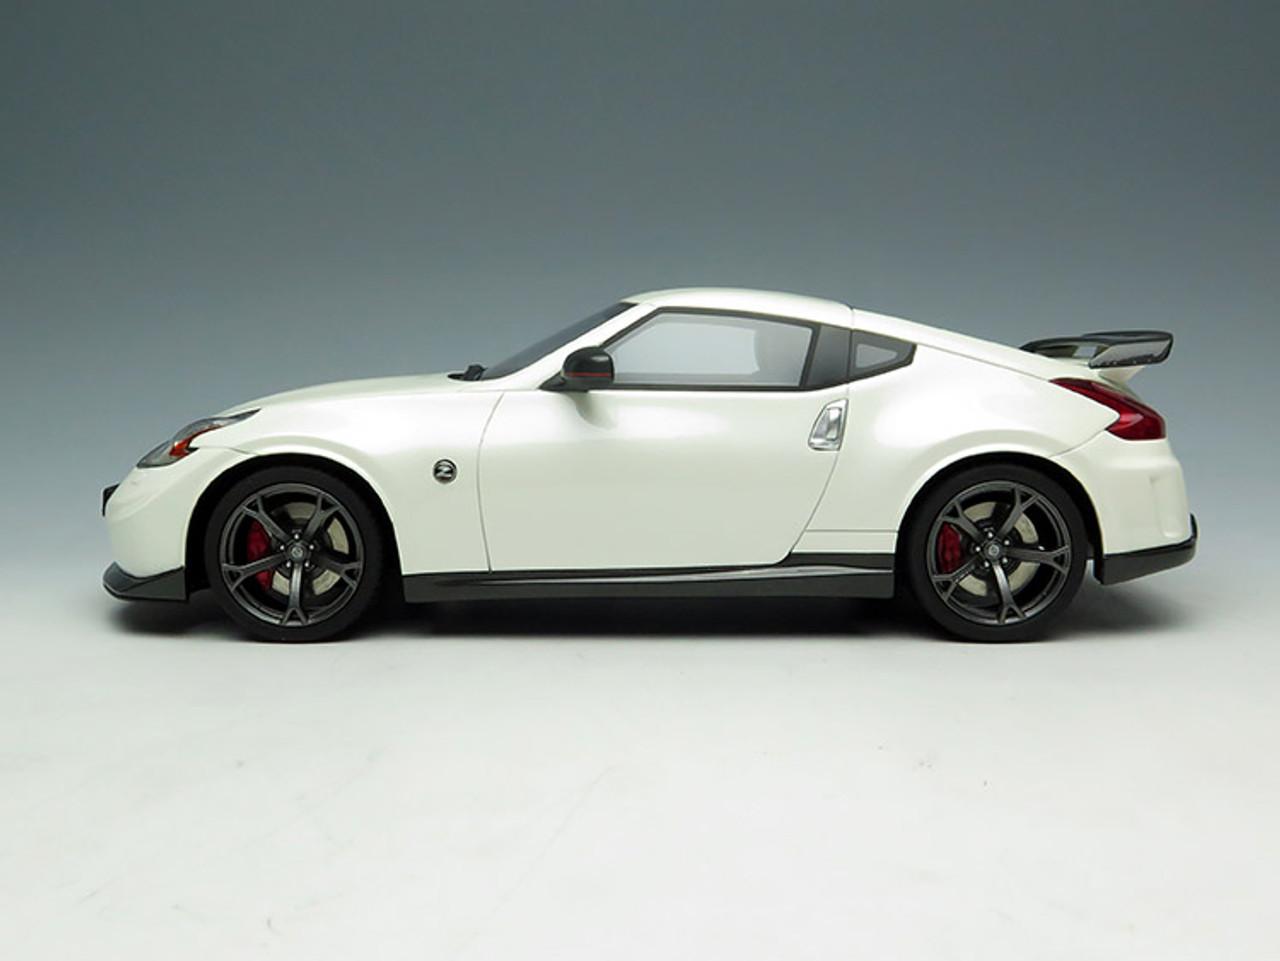 1/18 GTSpirit Nissan 370z Nismo Limited Edition